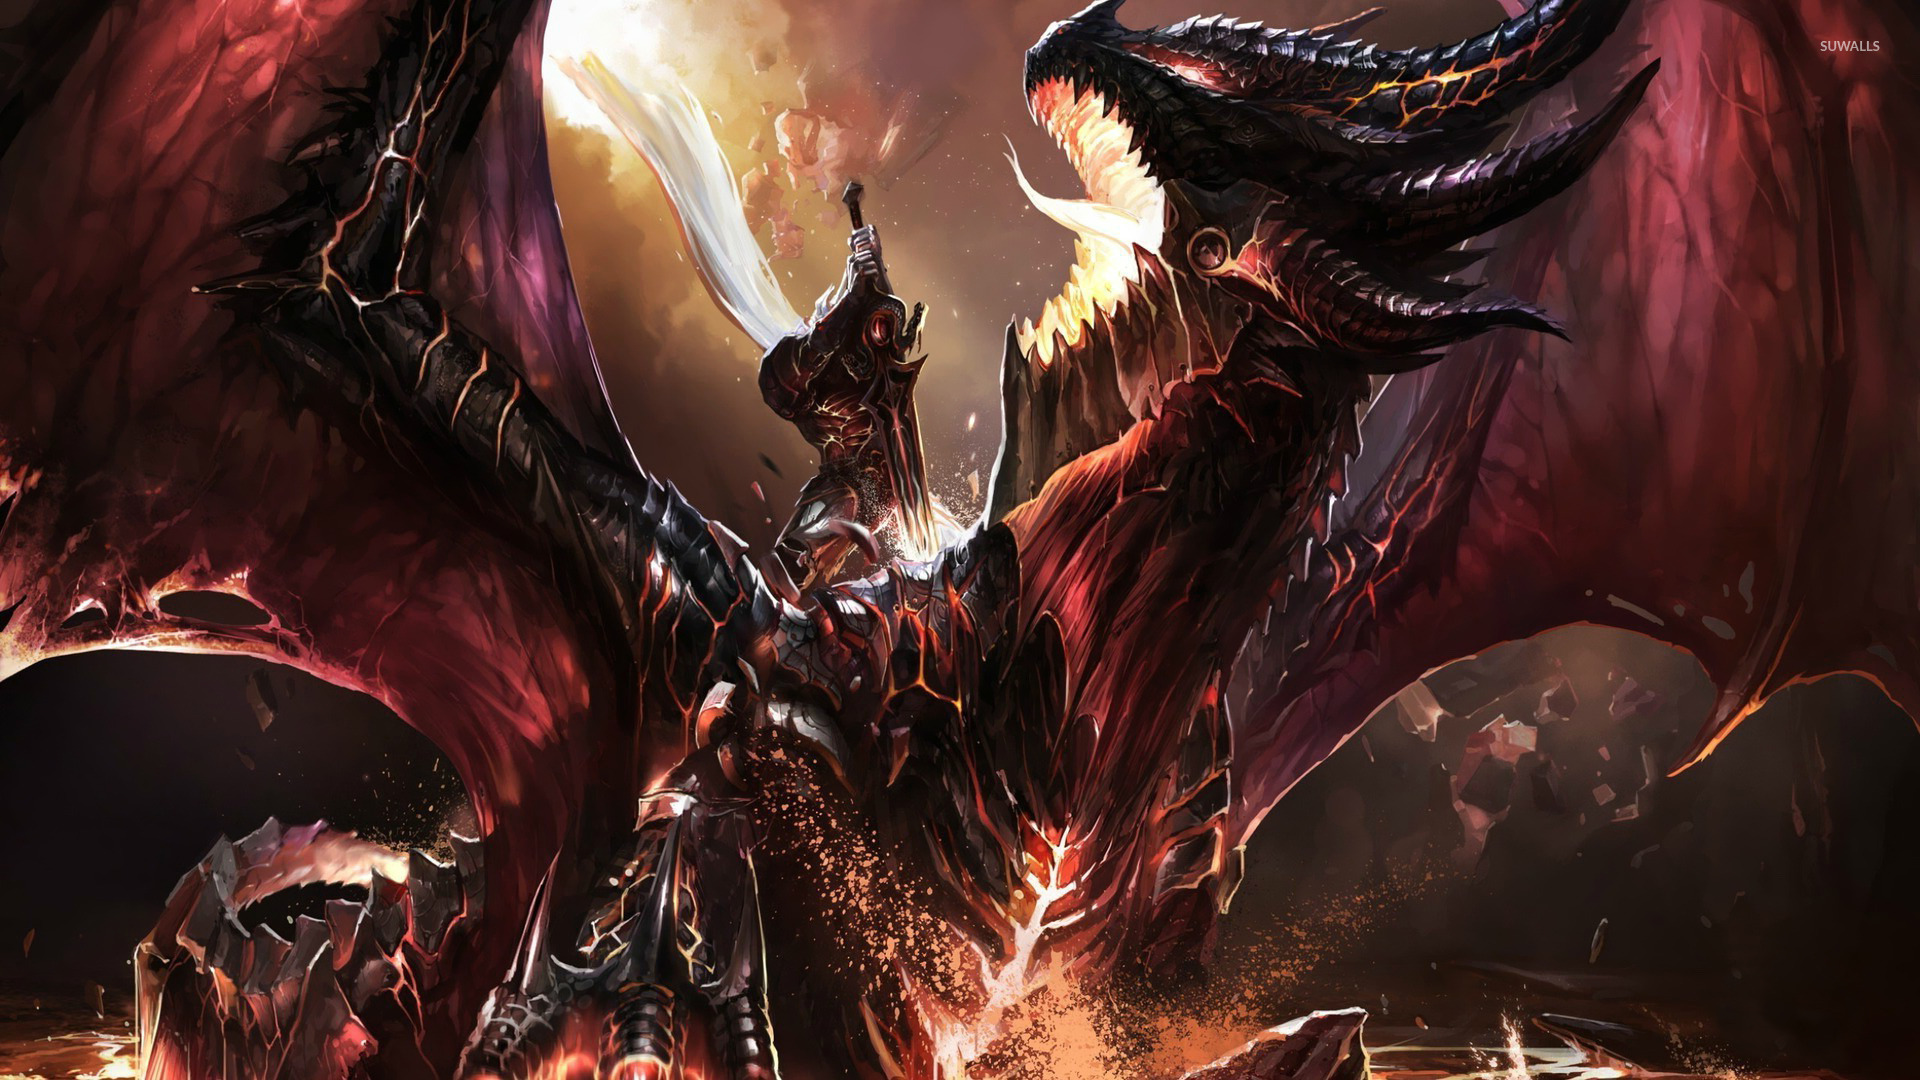 World of Warcraft: Cataclysm wallpaper - 727299  World Of Warcraft Cataclysm Wallpapers